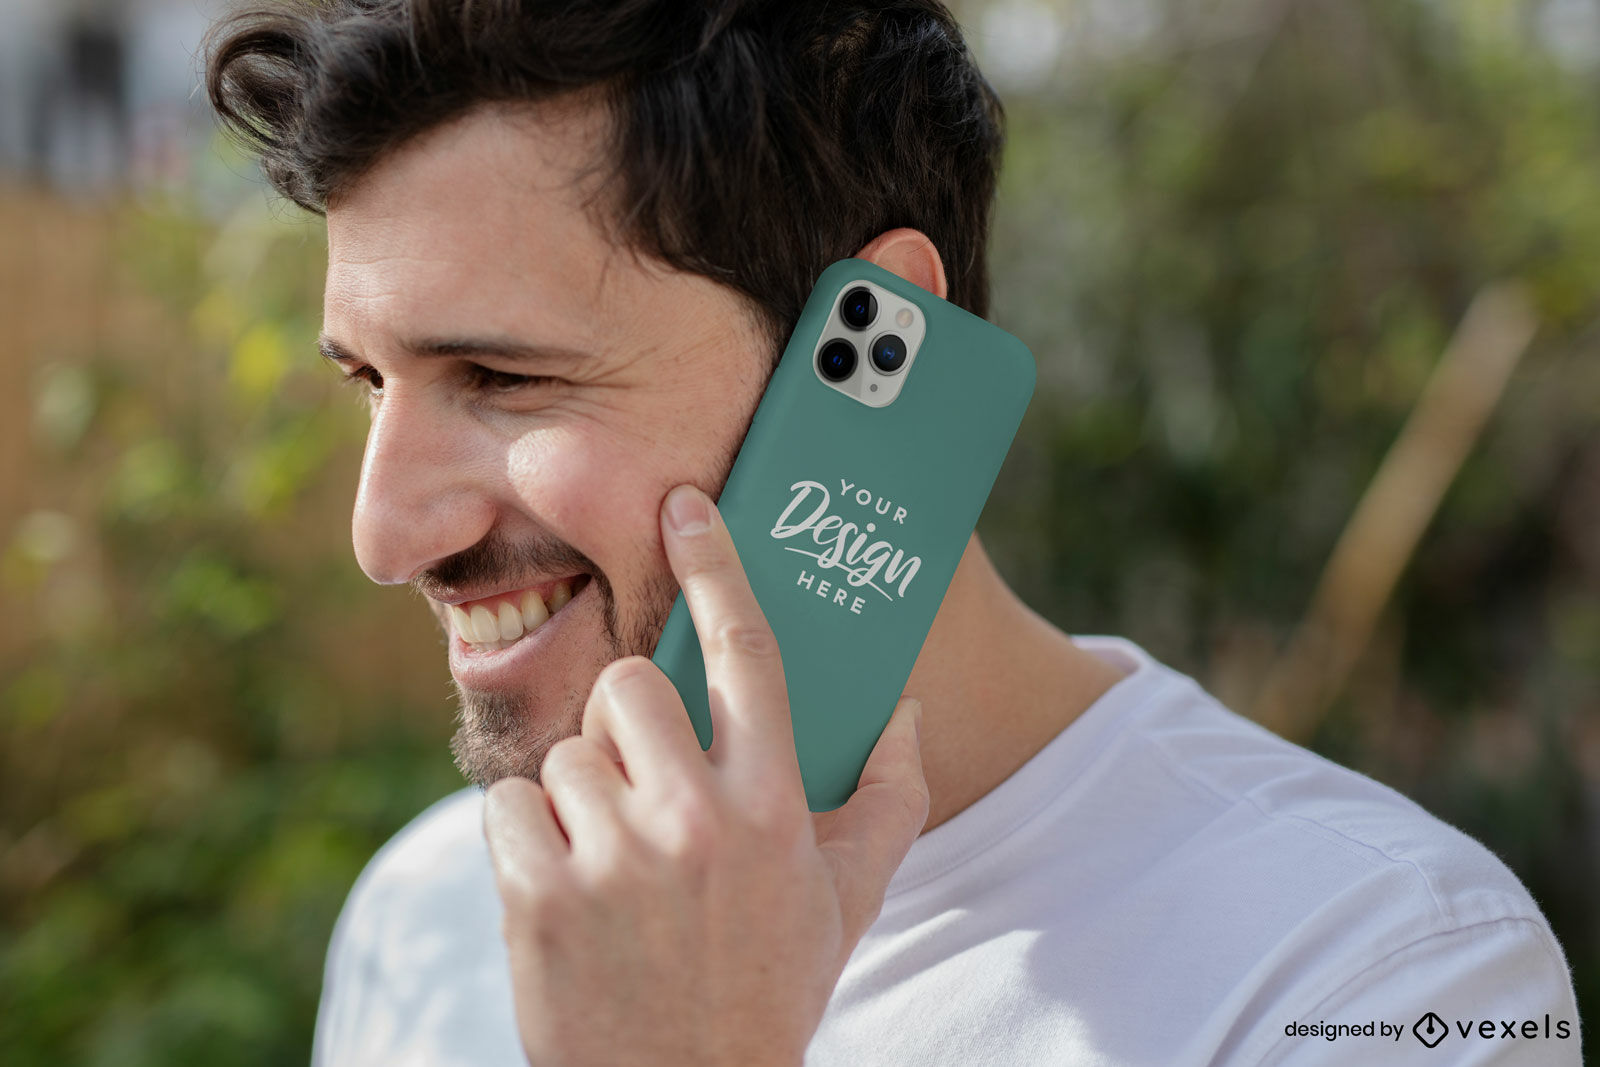 Mann mit grünem Handyhüllenmodell